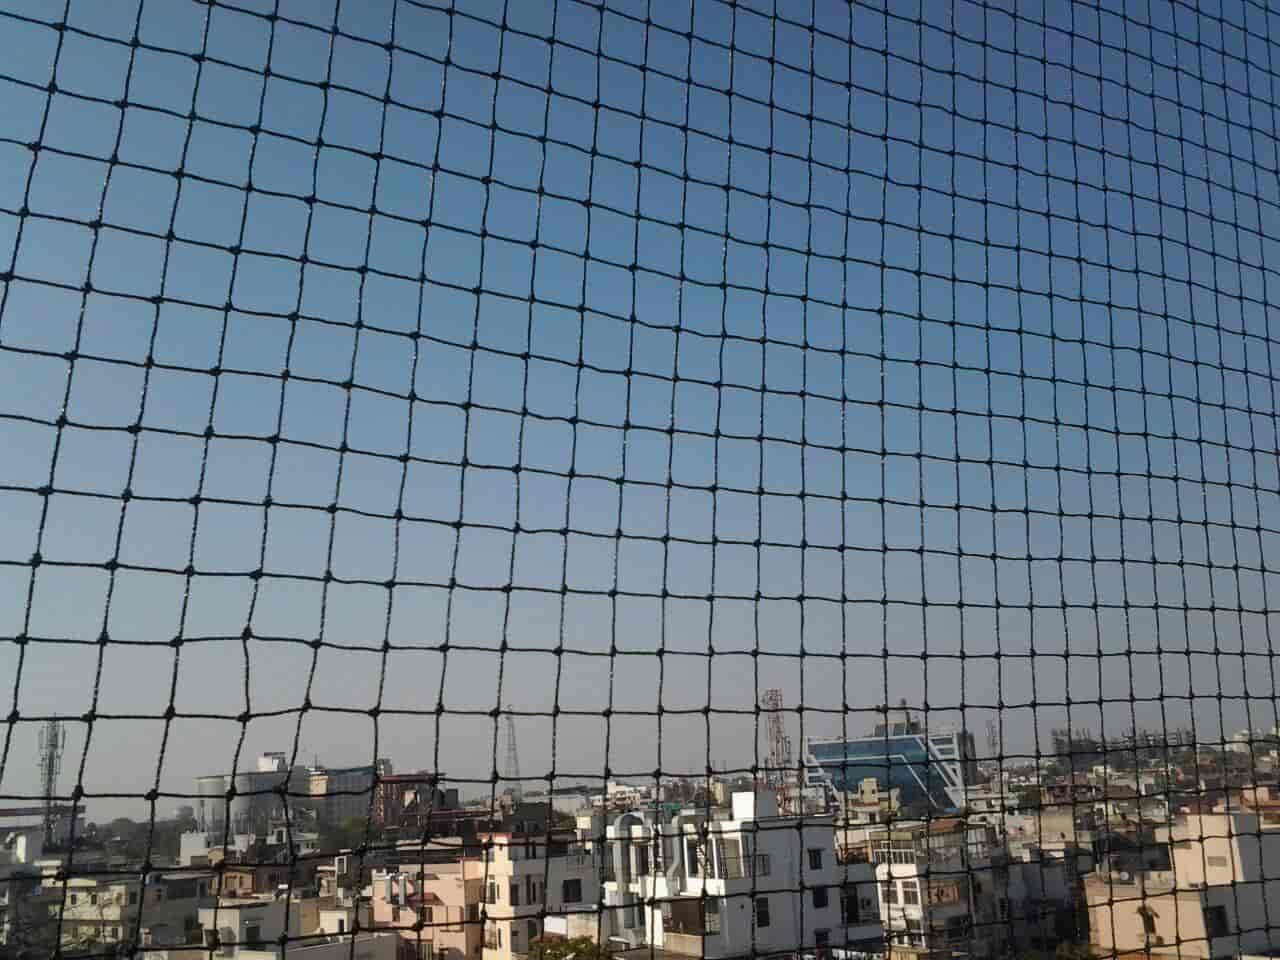 samridhi bird nets photos johri bazar jaipur pictures images